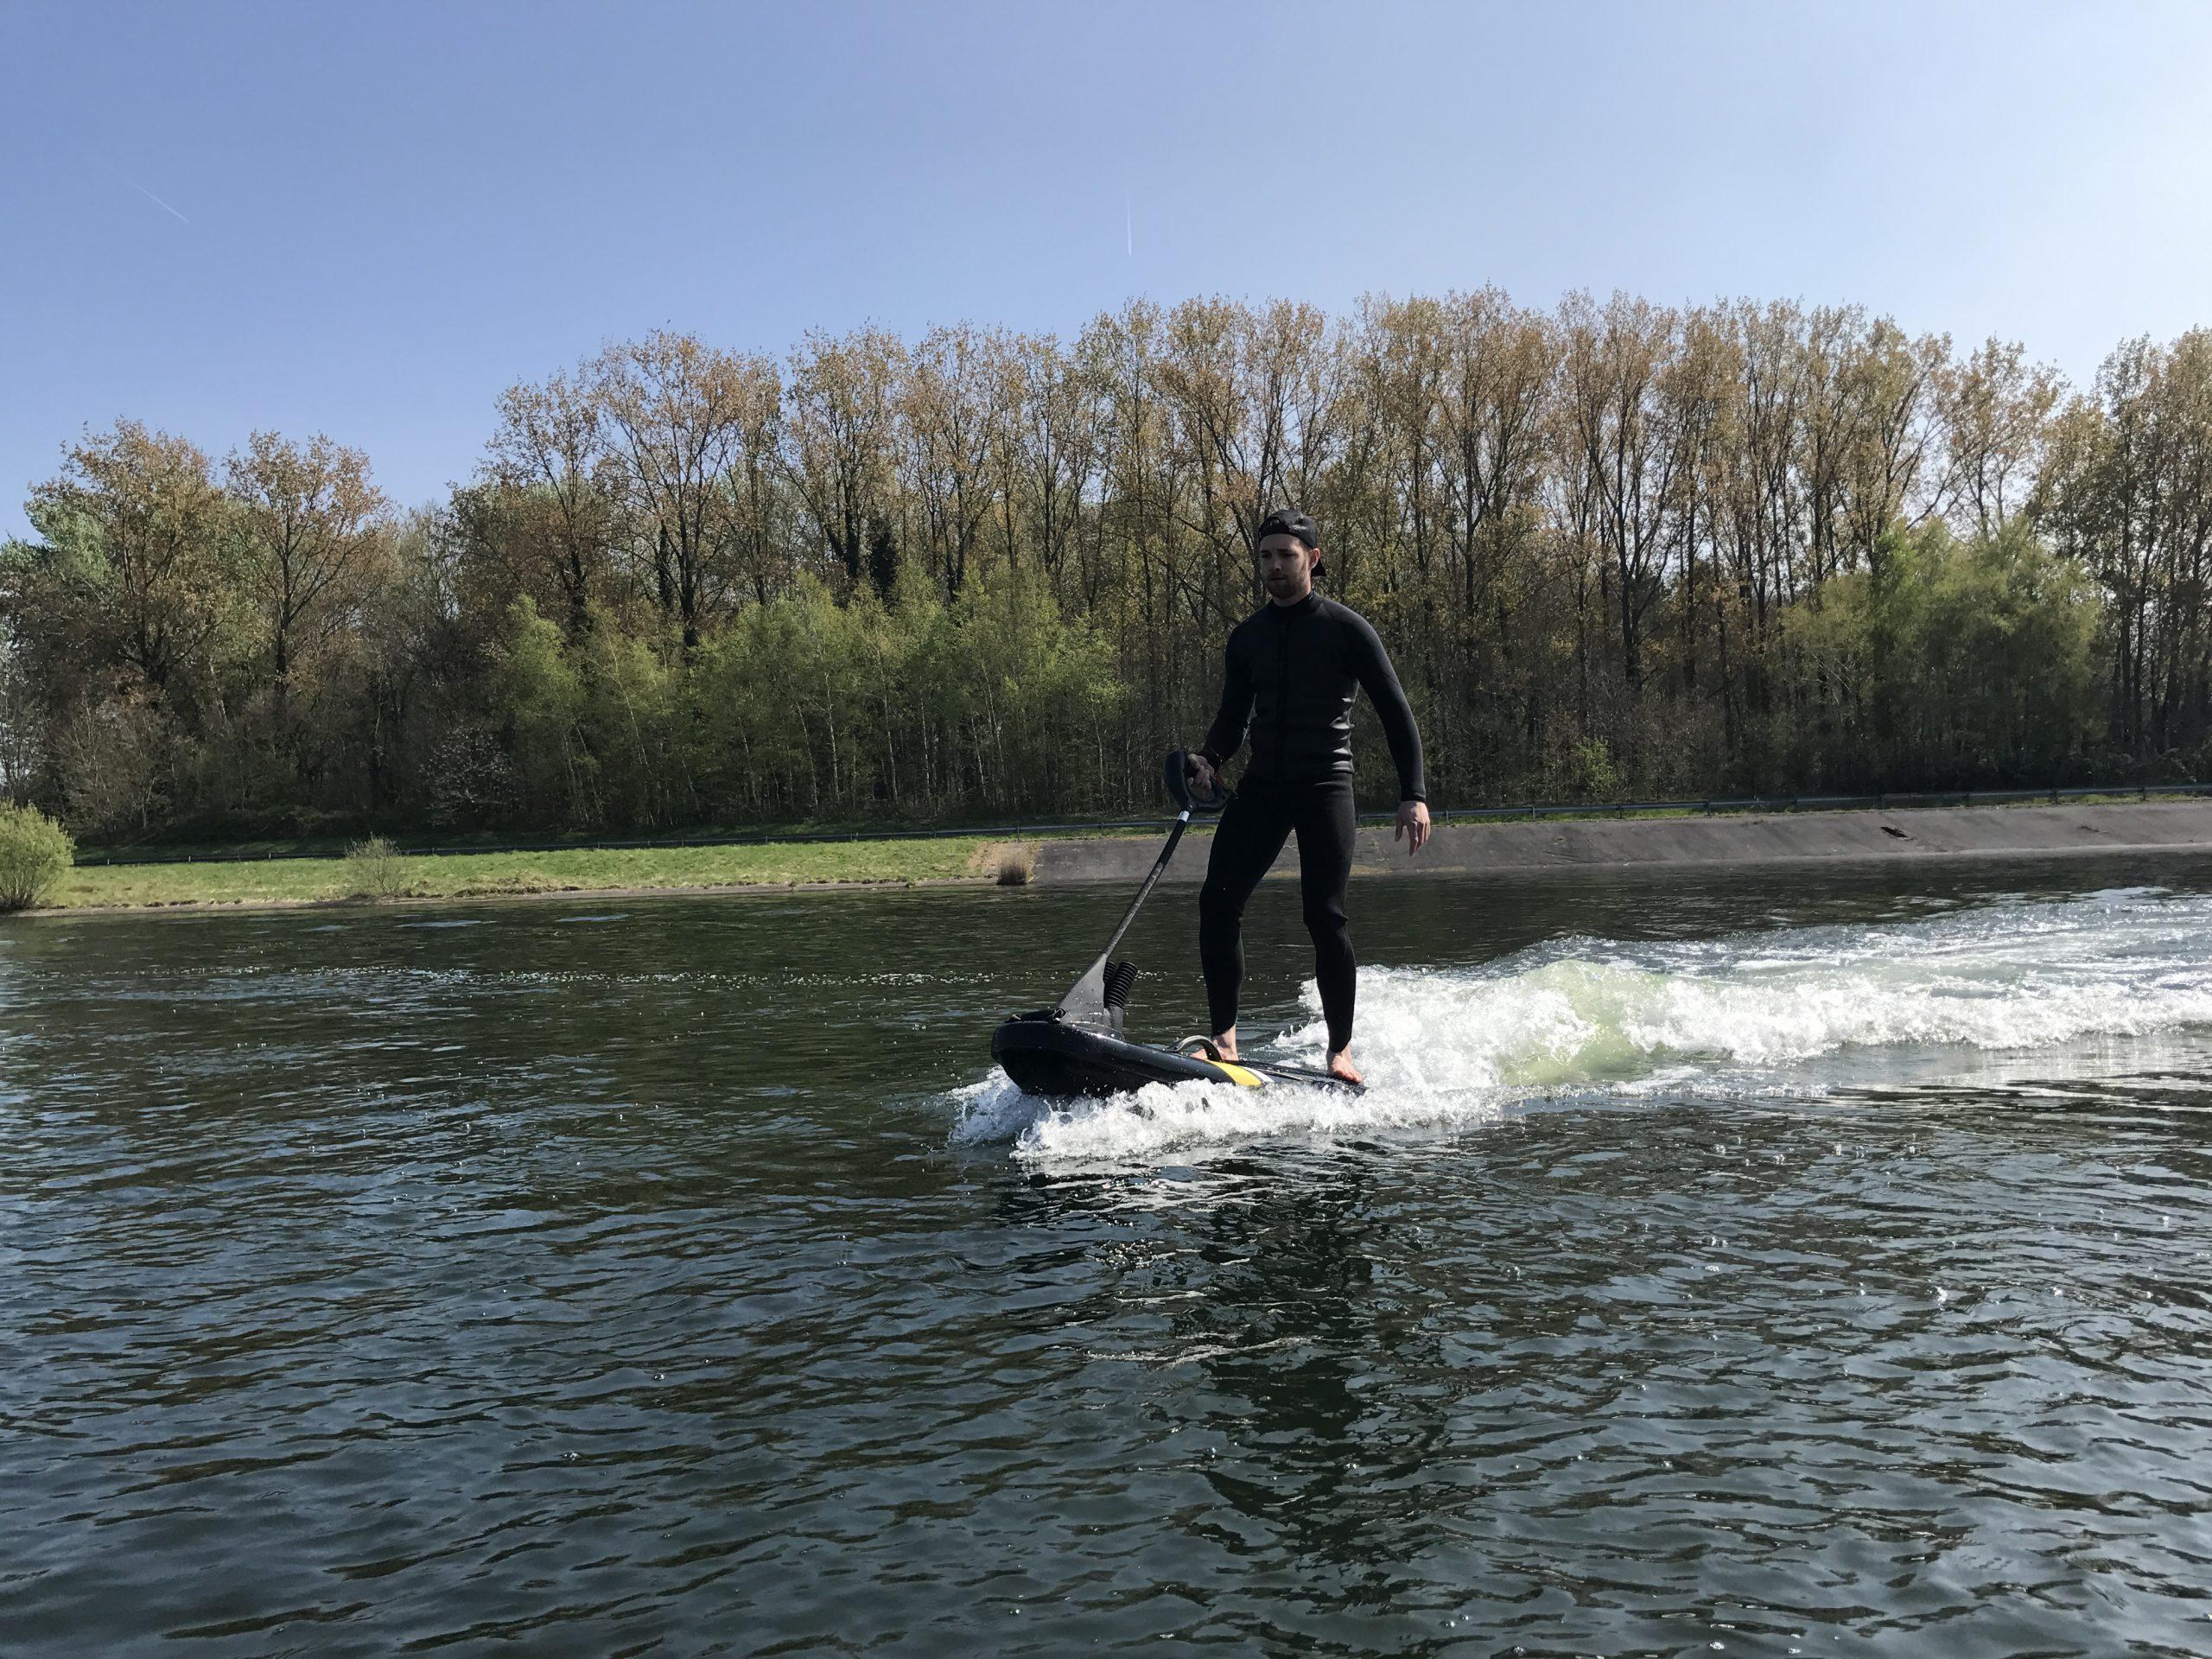 jetsurf-slide-3